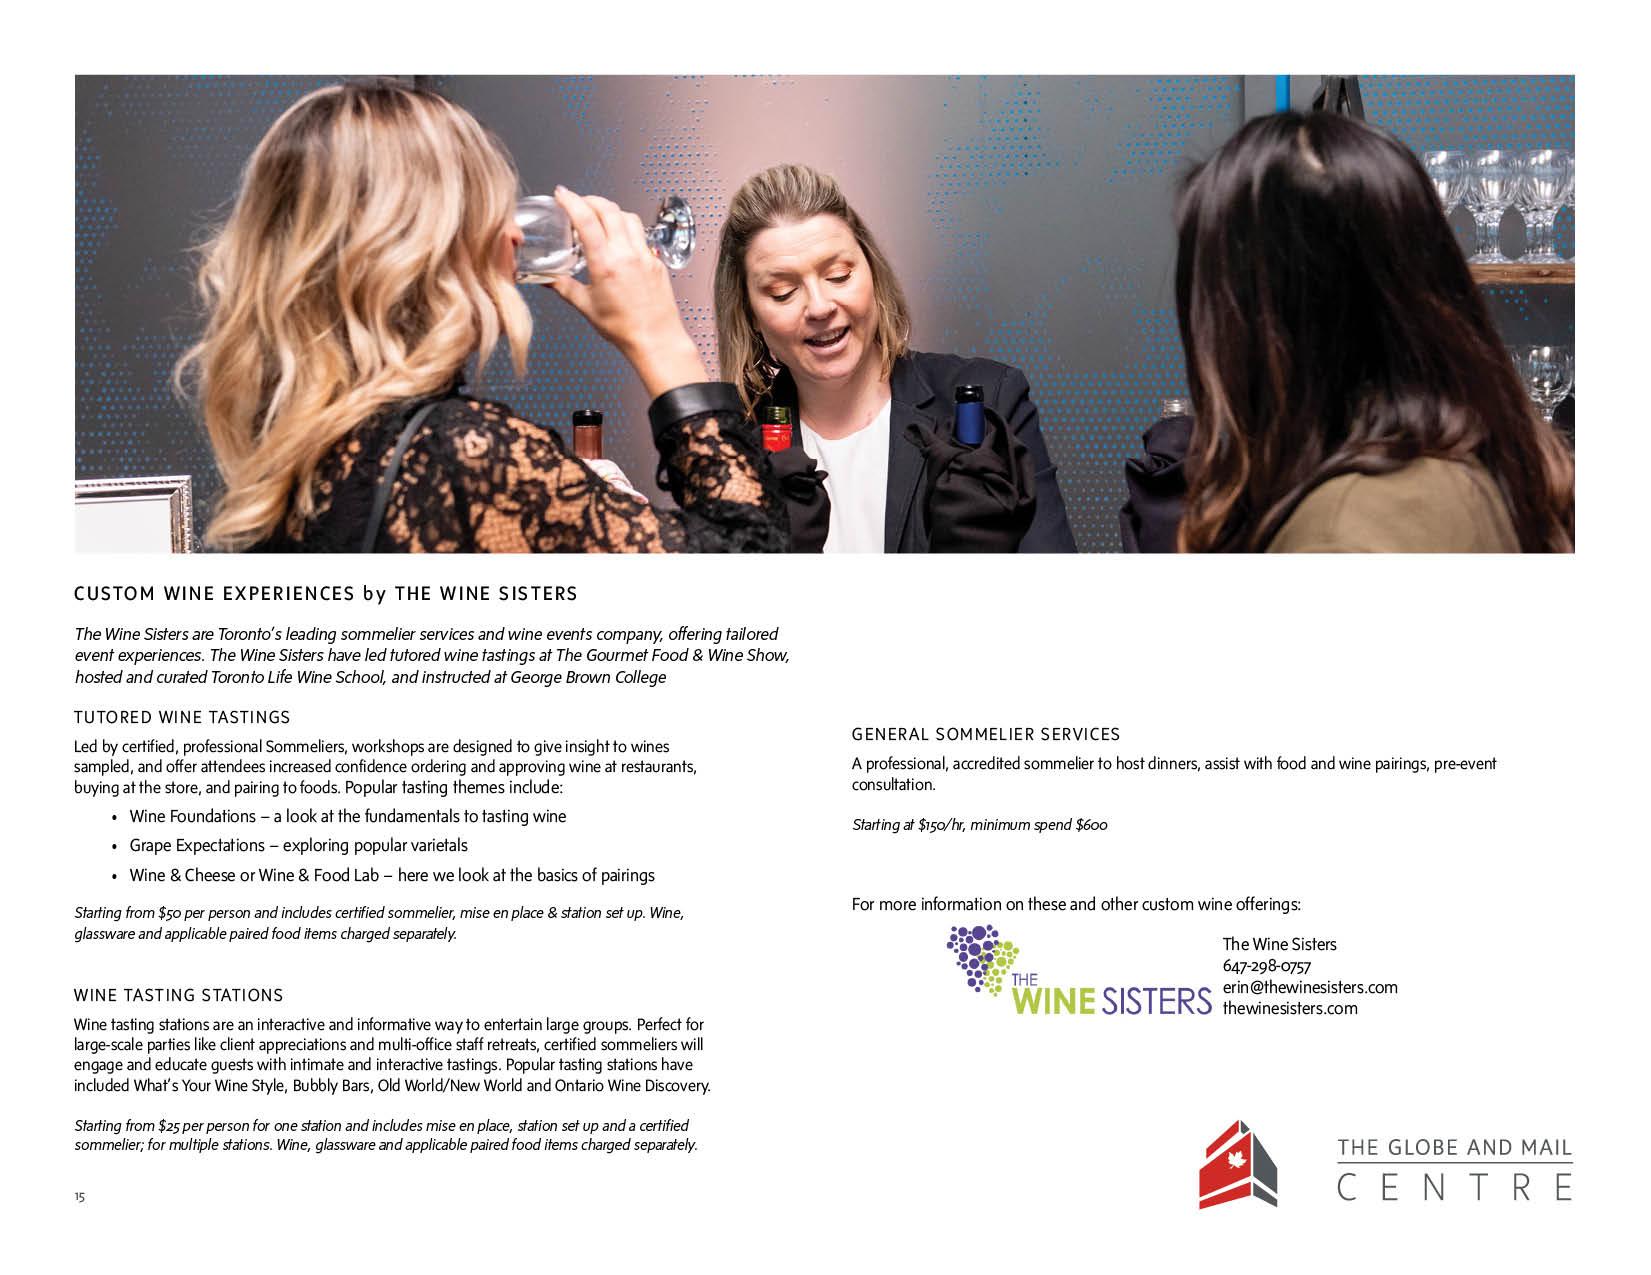 2019-09-01 GAMC Corporate Events15.jpg